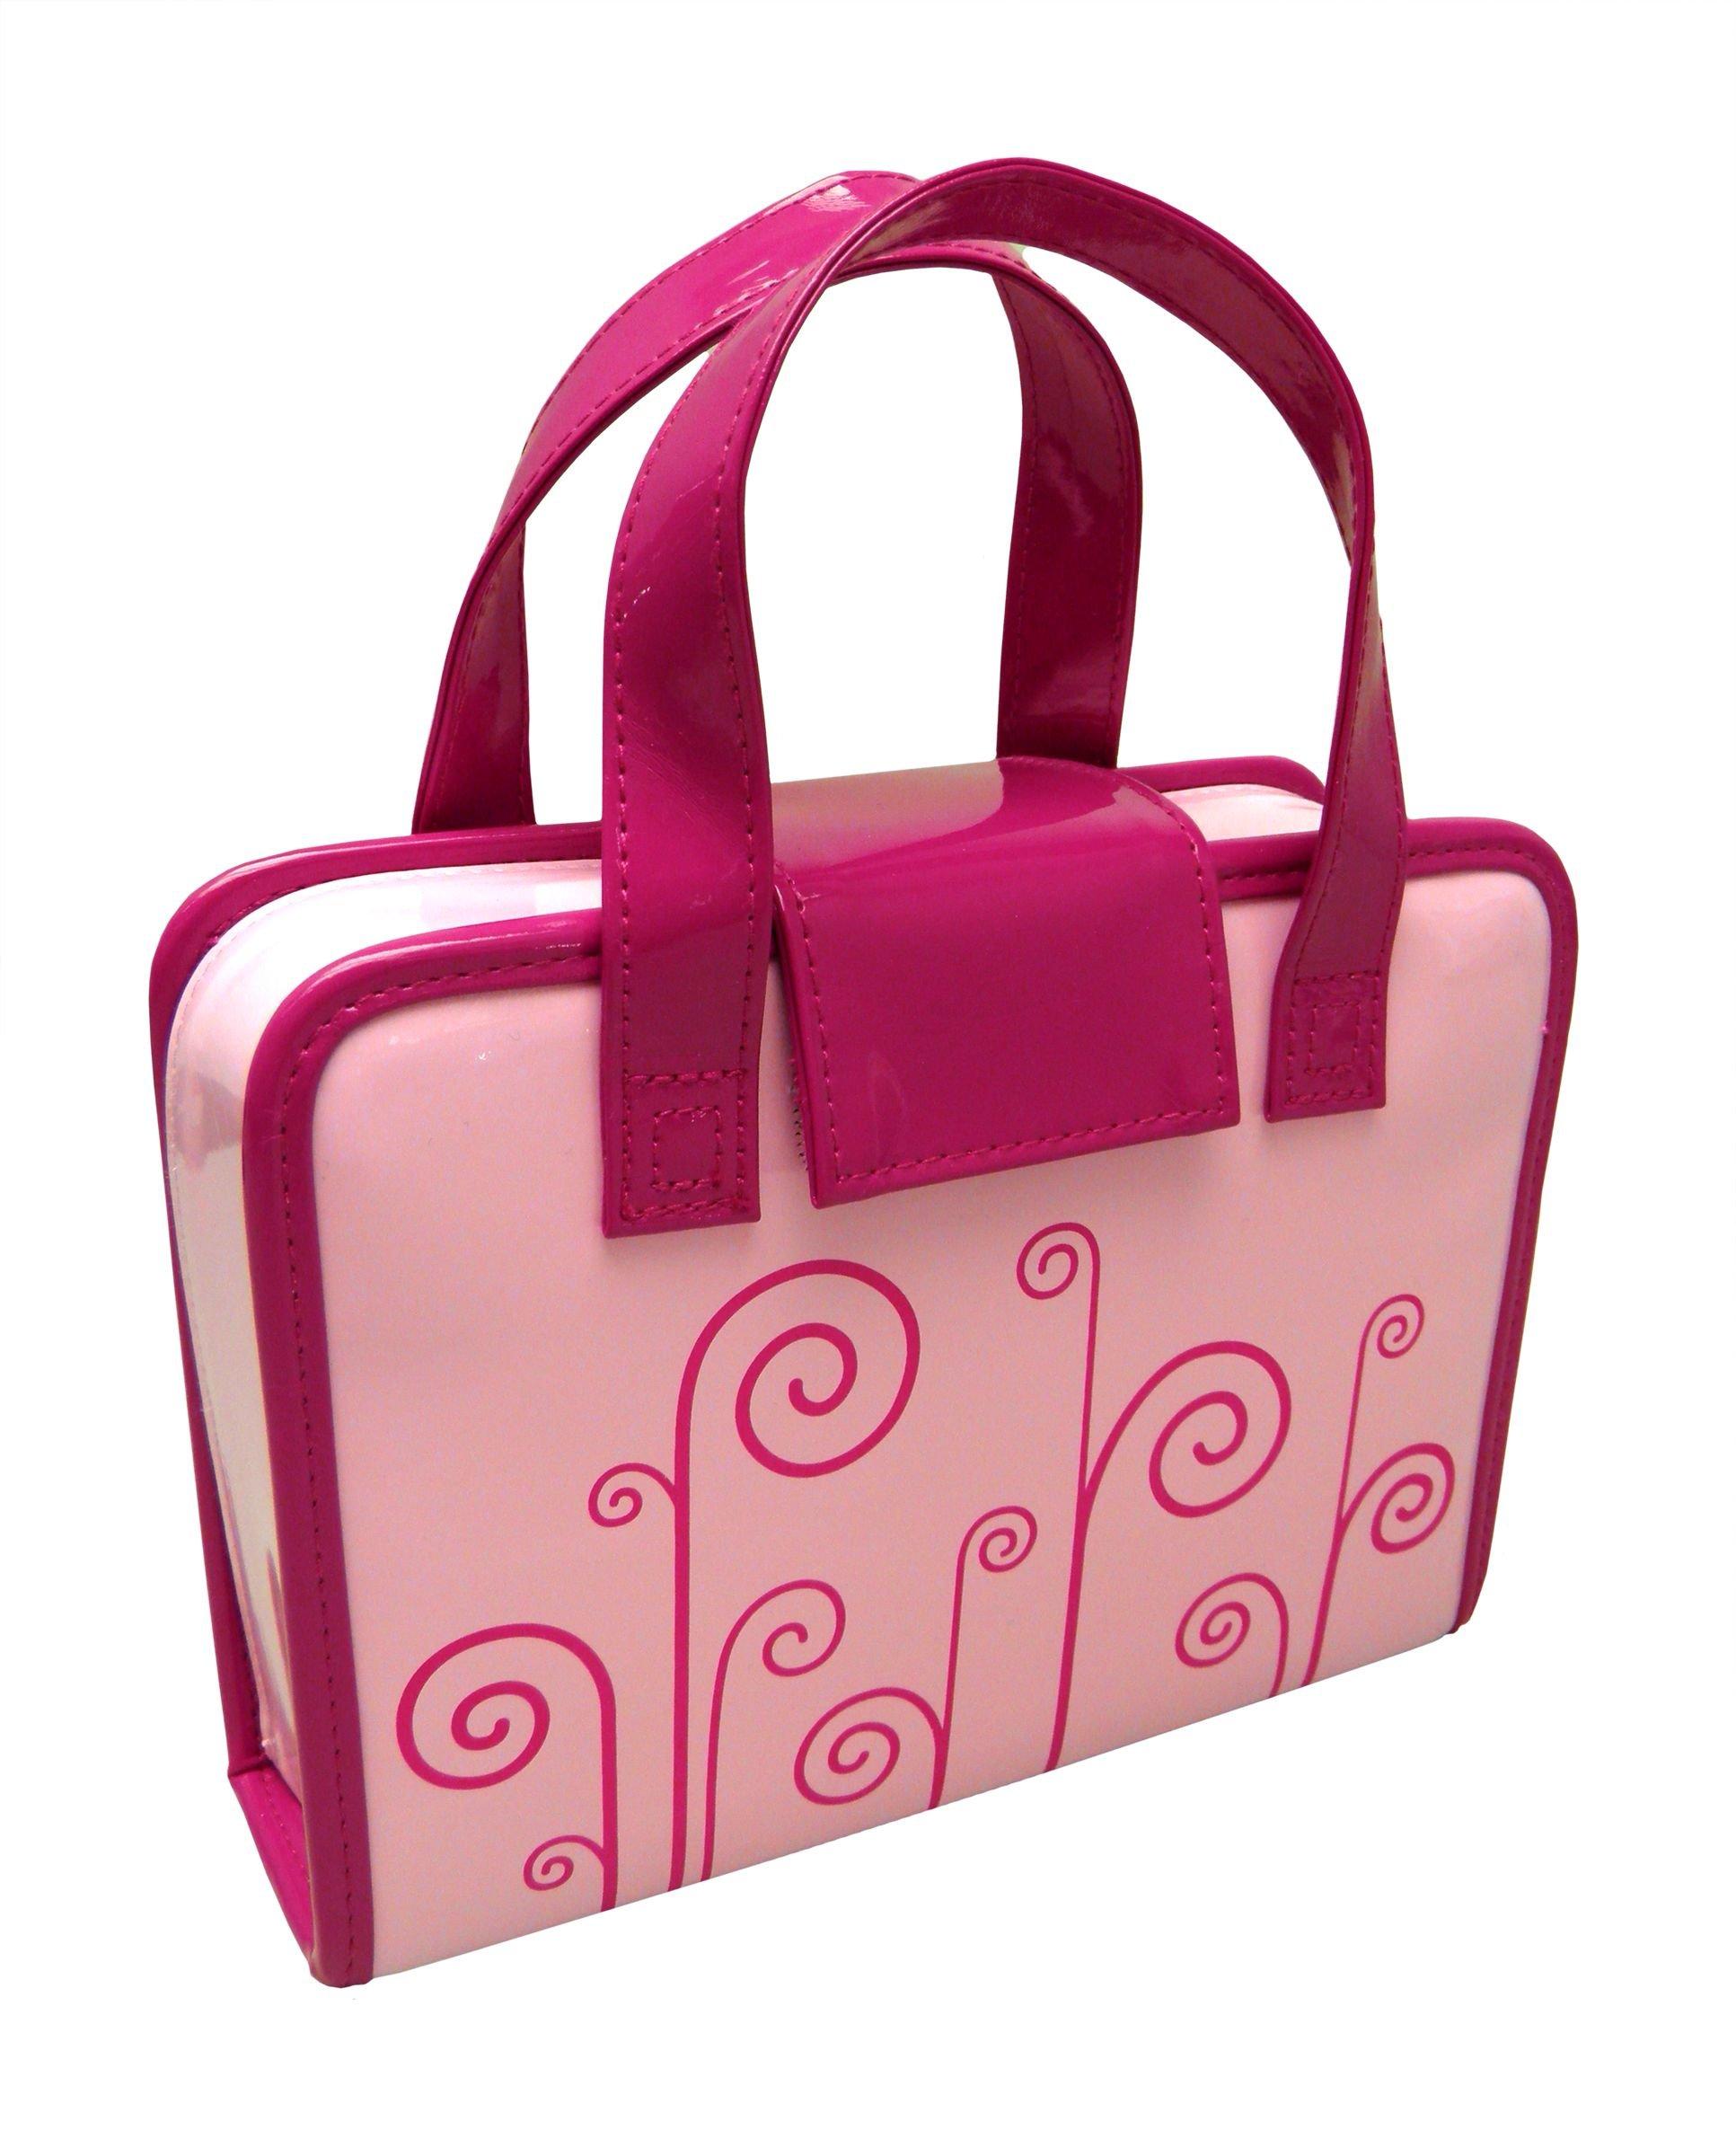 LeapFrog LeapPad Fashion Handbag (Works with LeapPad2 and LeapPad1)